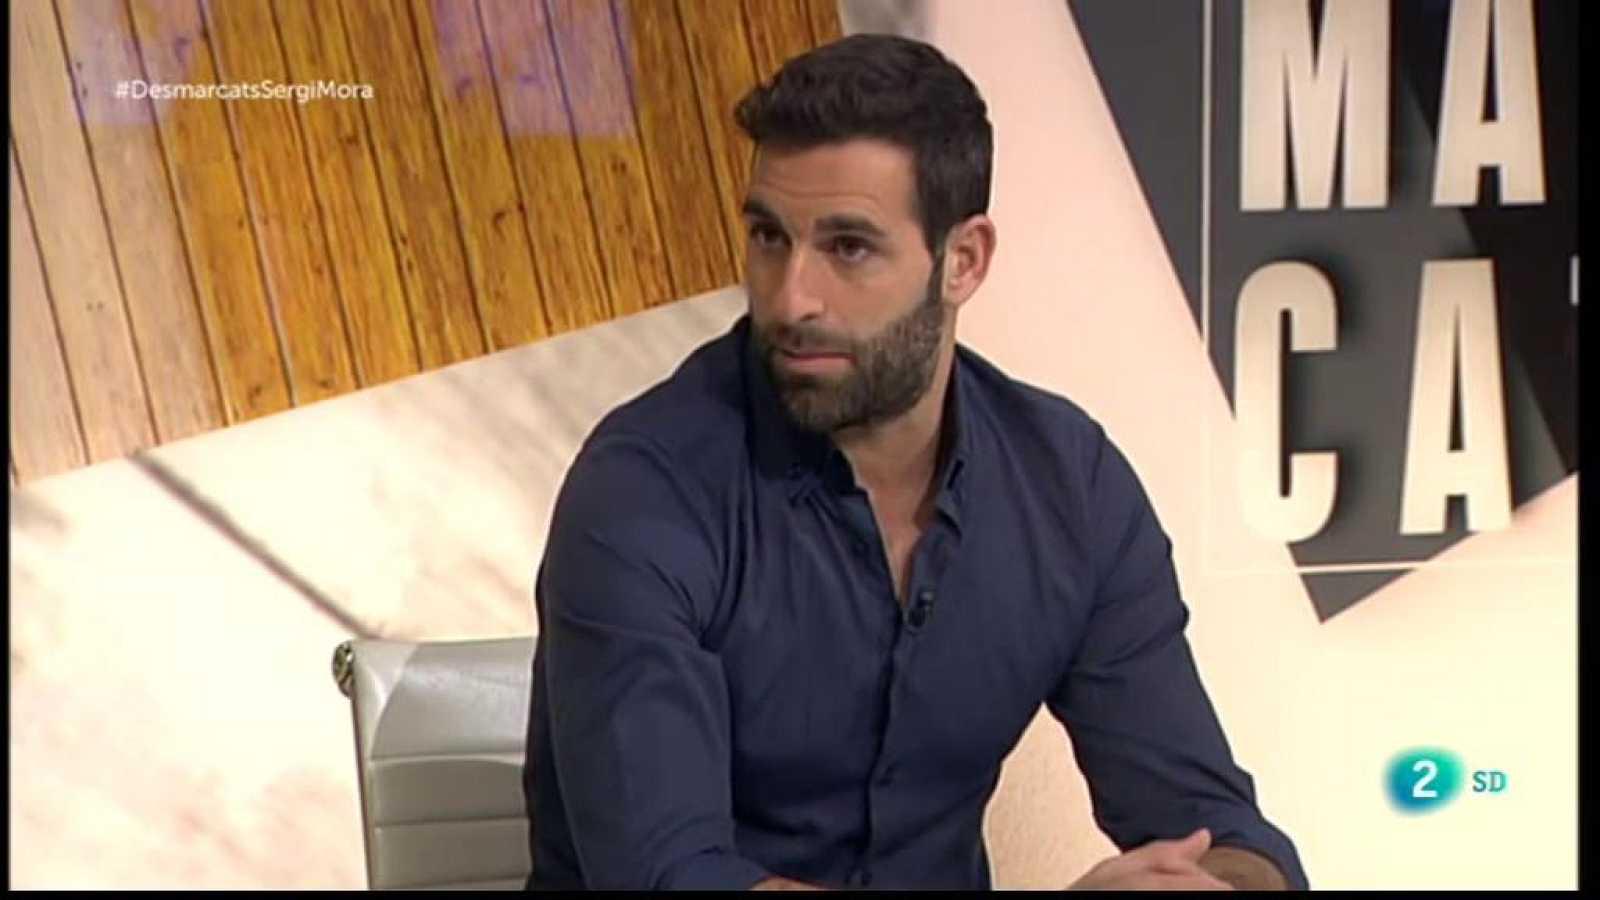 Desmarcats - Entrevista a Sergi Mora